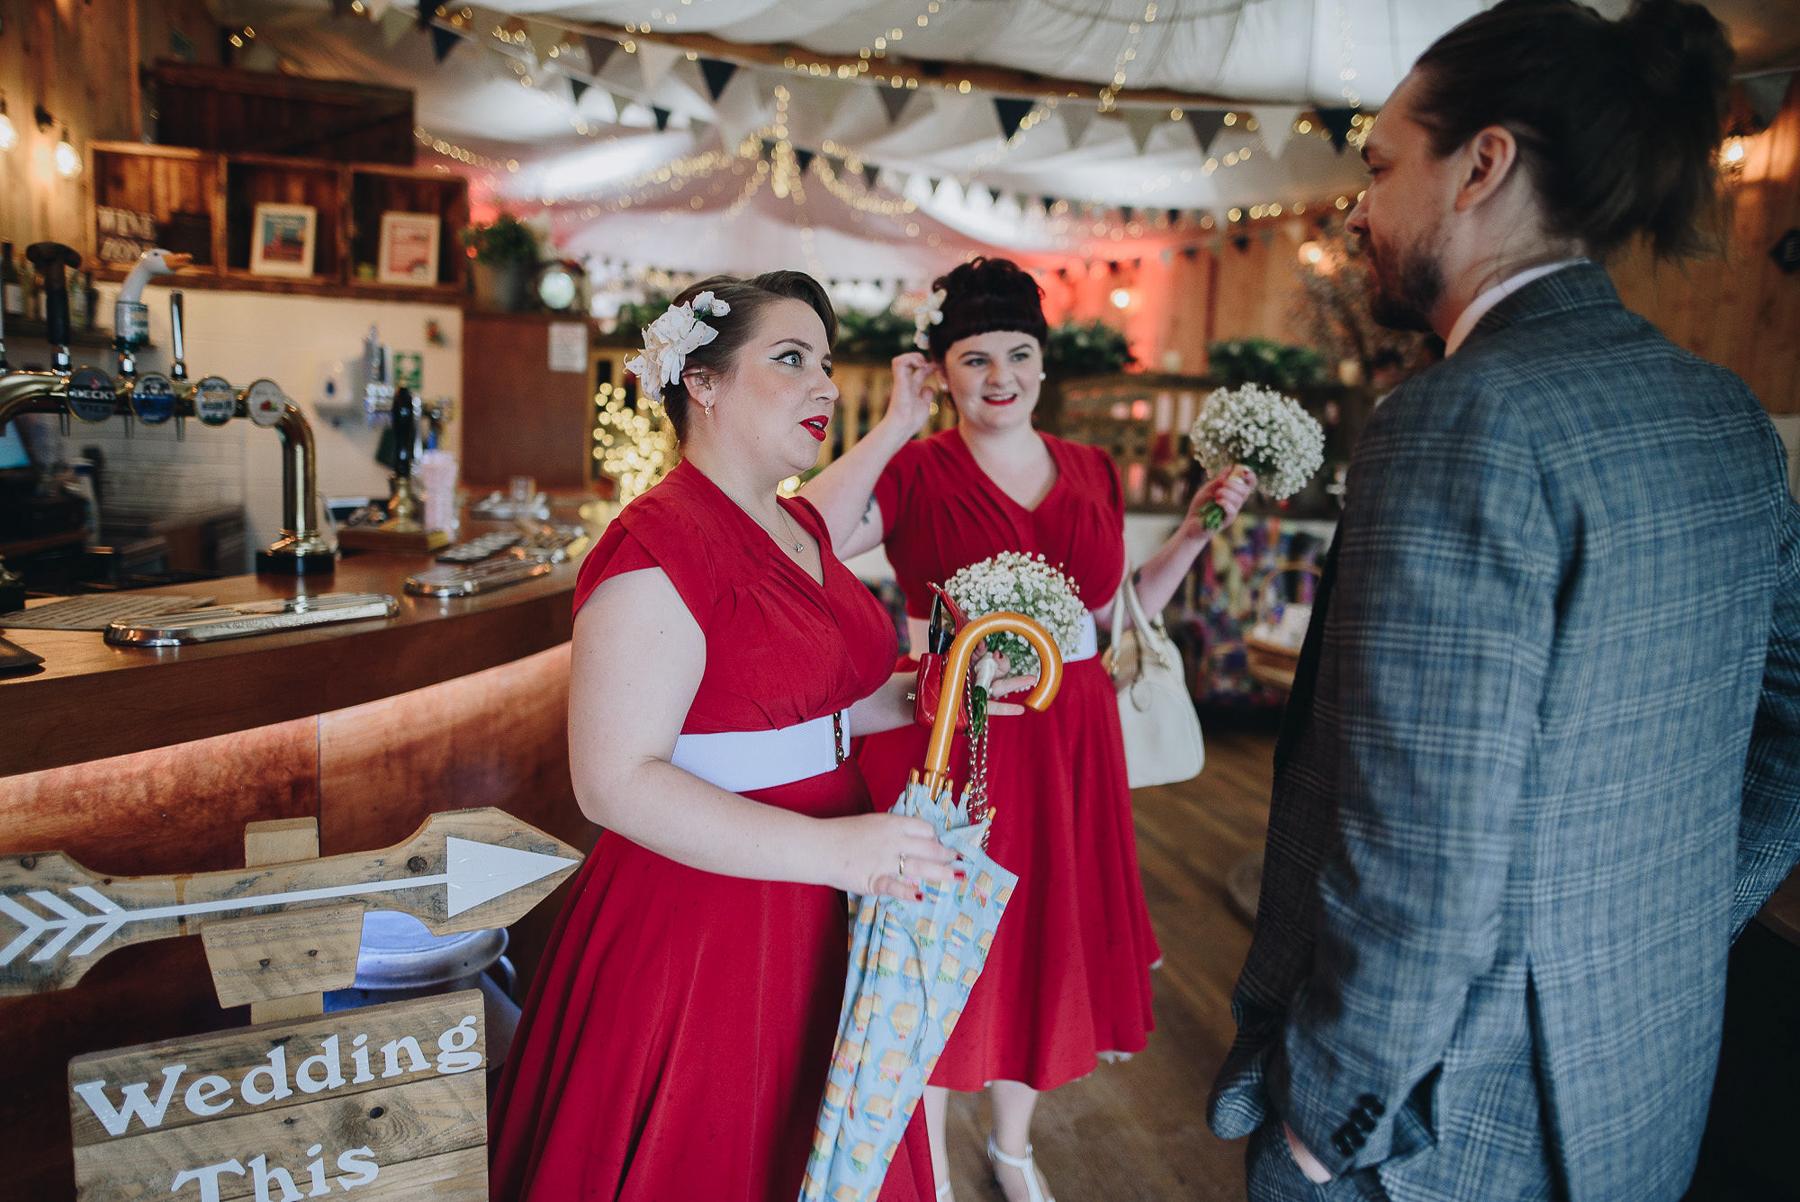 Wellbeing_Farm_Wedding_Photography_The_Pin-Up_Bride_Lara_Shaun-41.jpg